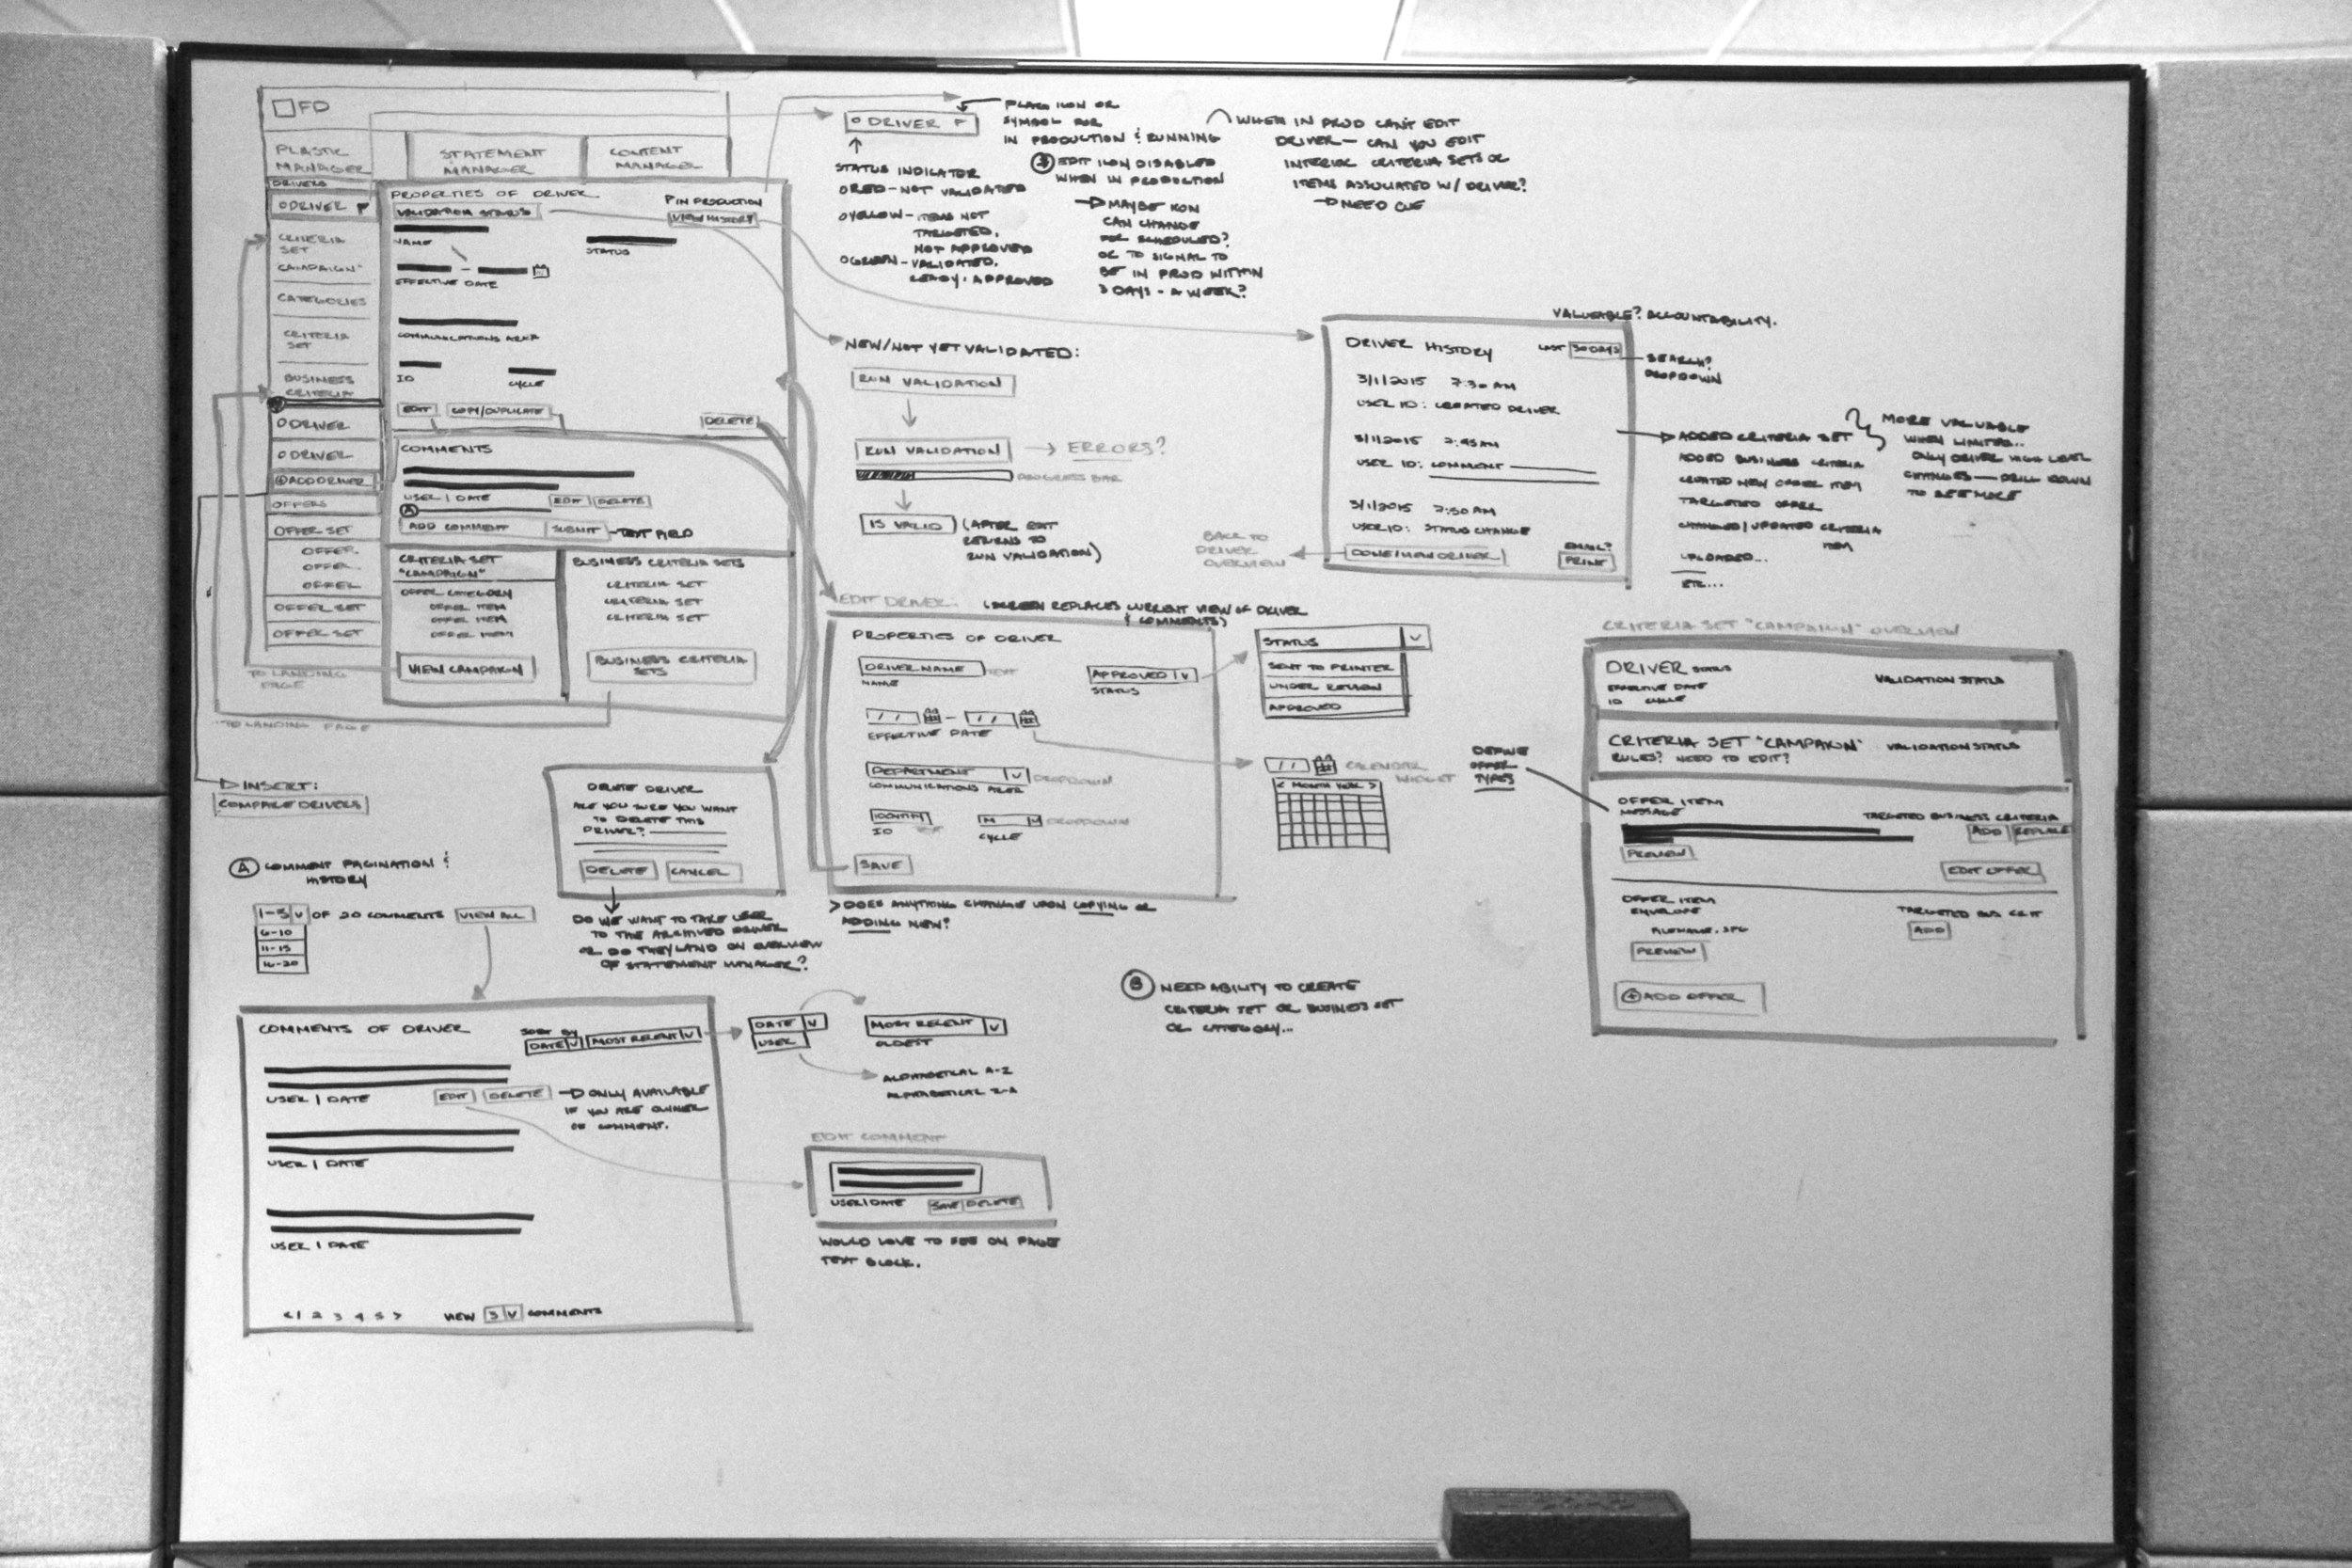 White-boarding session for deeper understanding of user flow